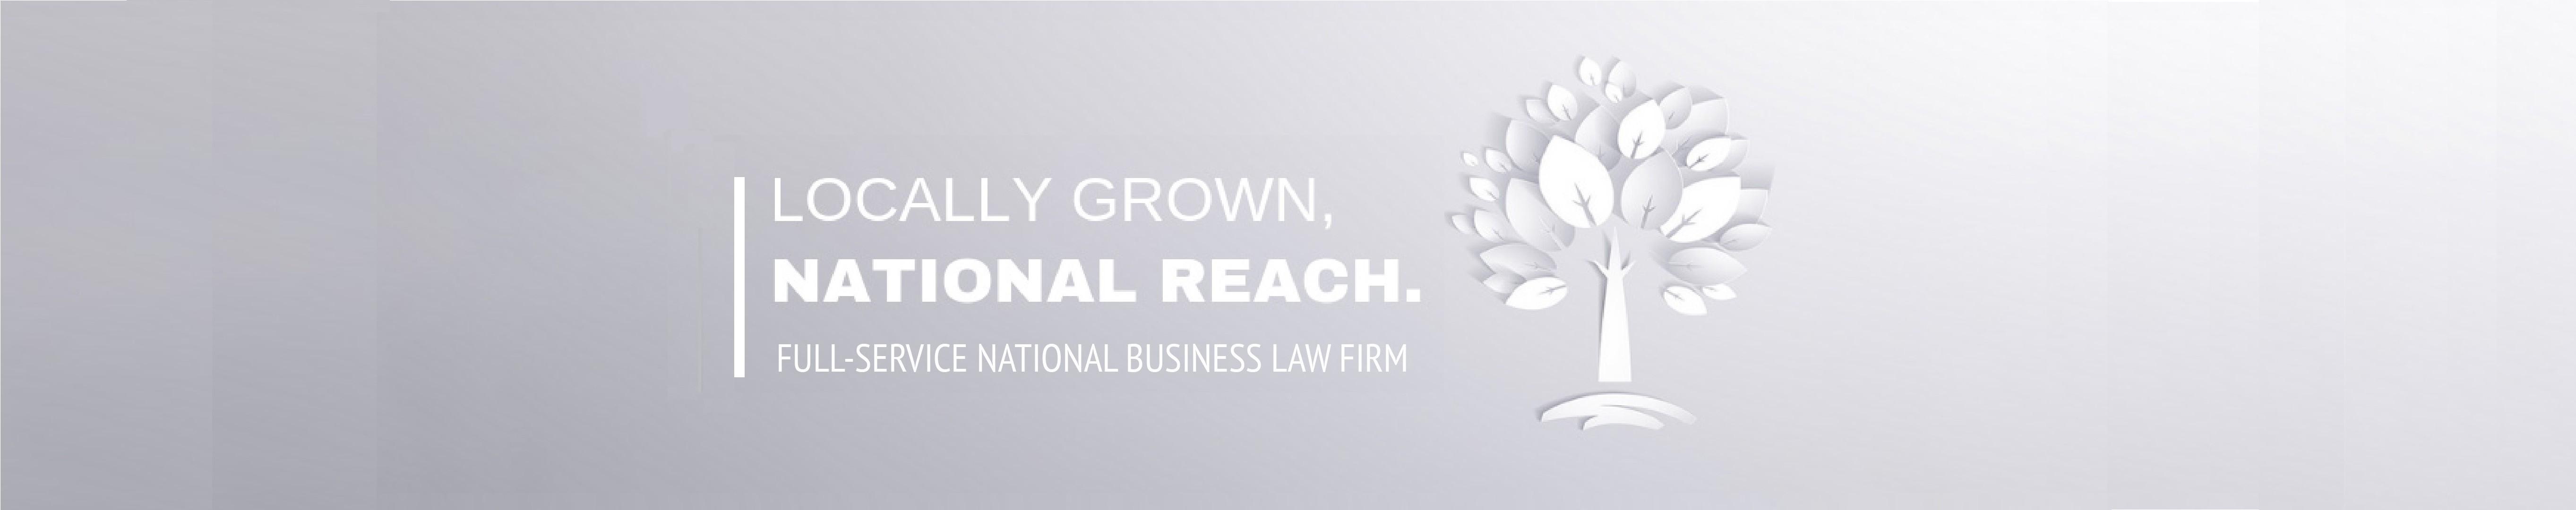 Greenspoon Marder LLP | LinkedIn